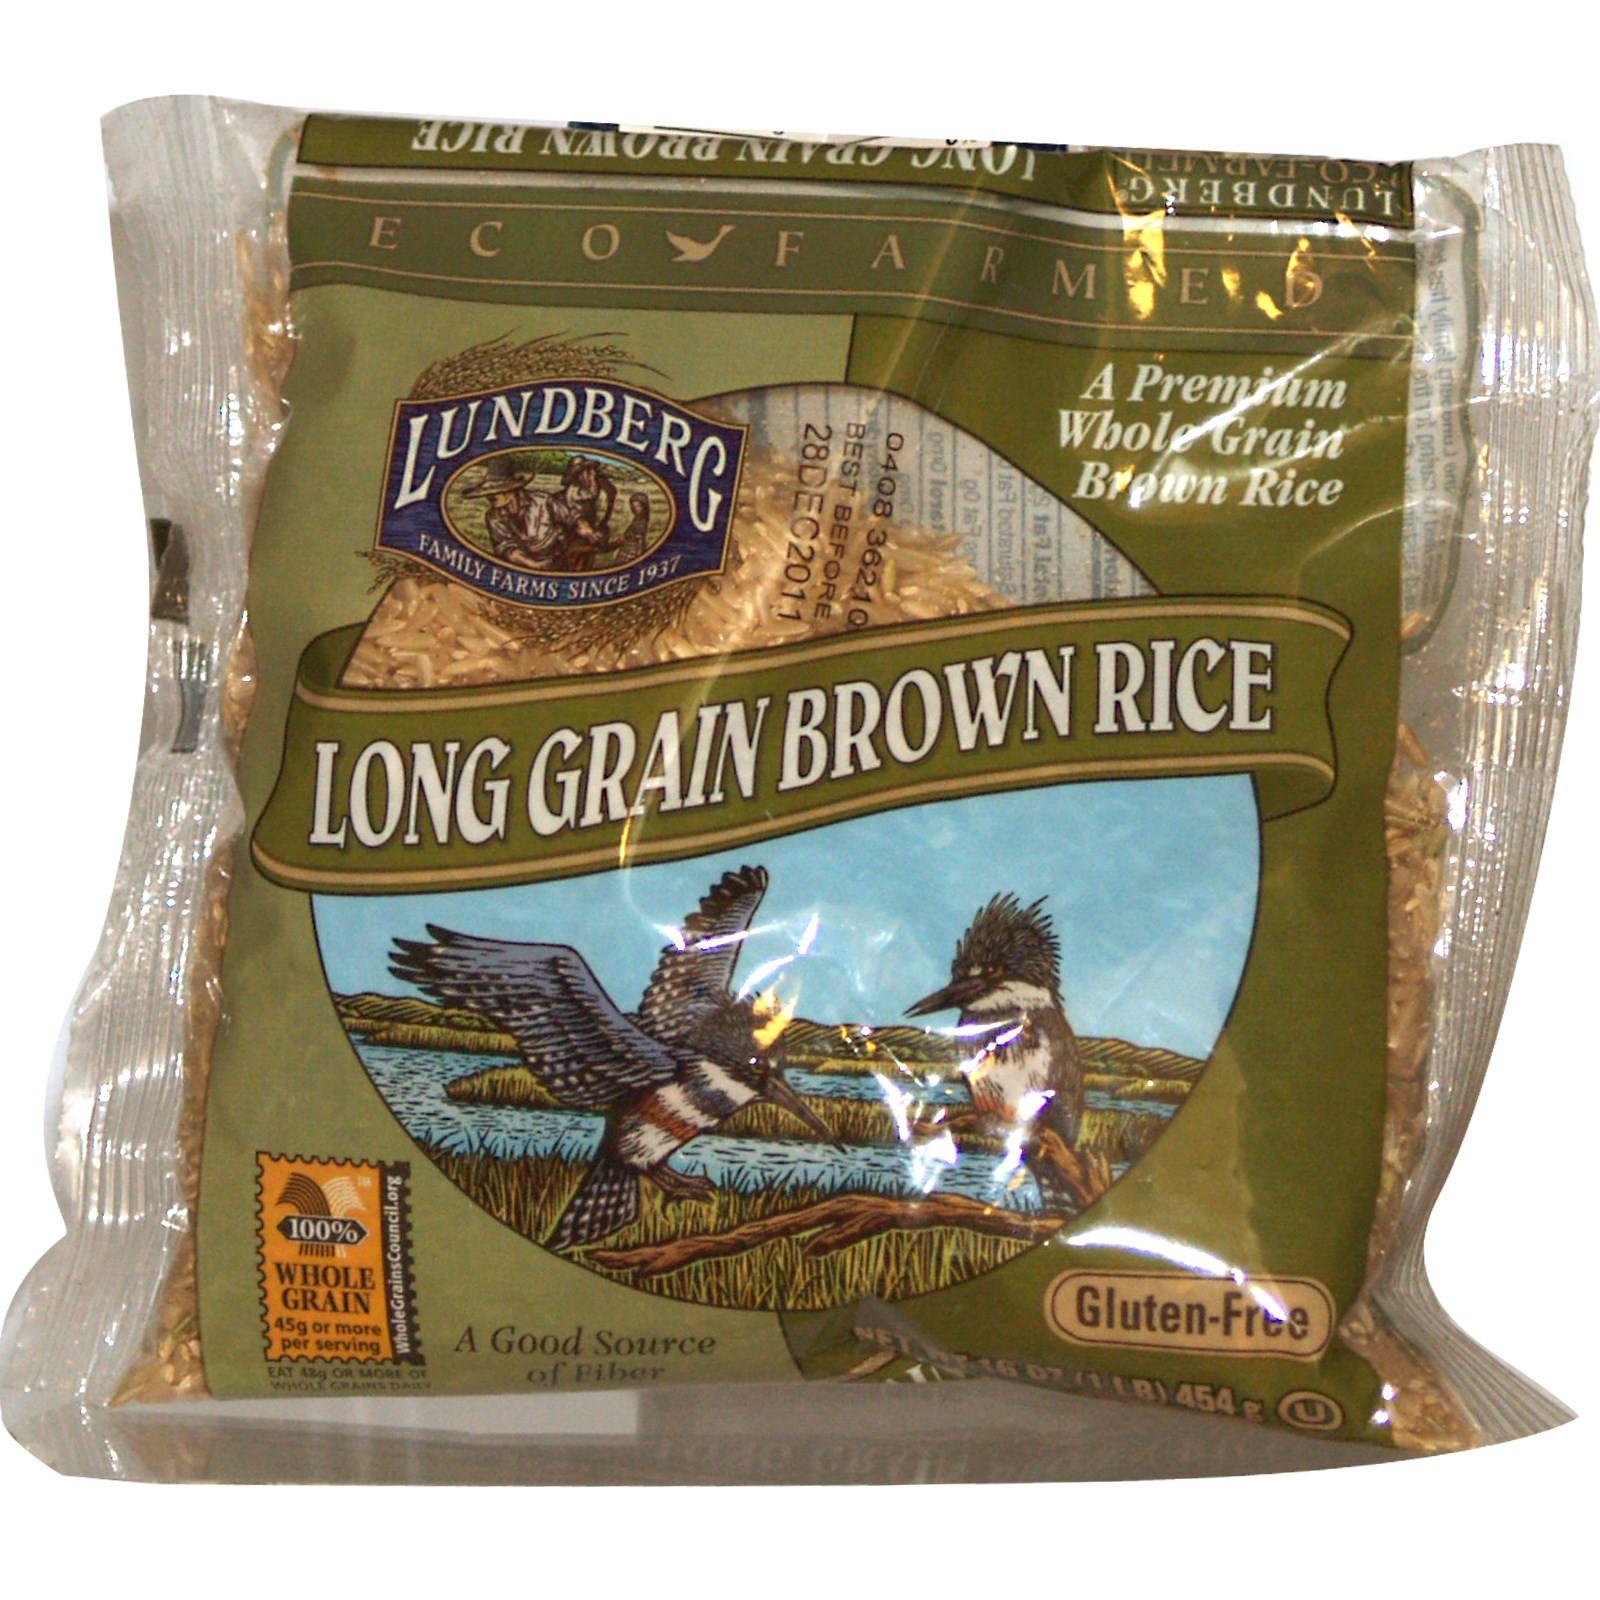 Is Brown Rice Gluten Free  Lundberg Long Grain Brown Rice Gluten Free 16 oz 454 g